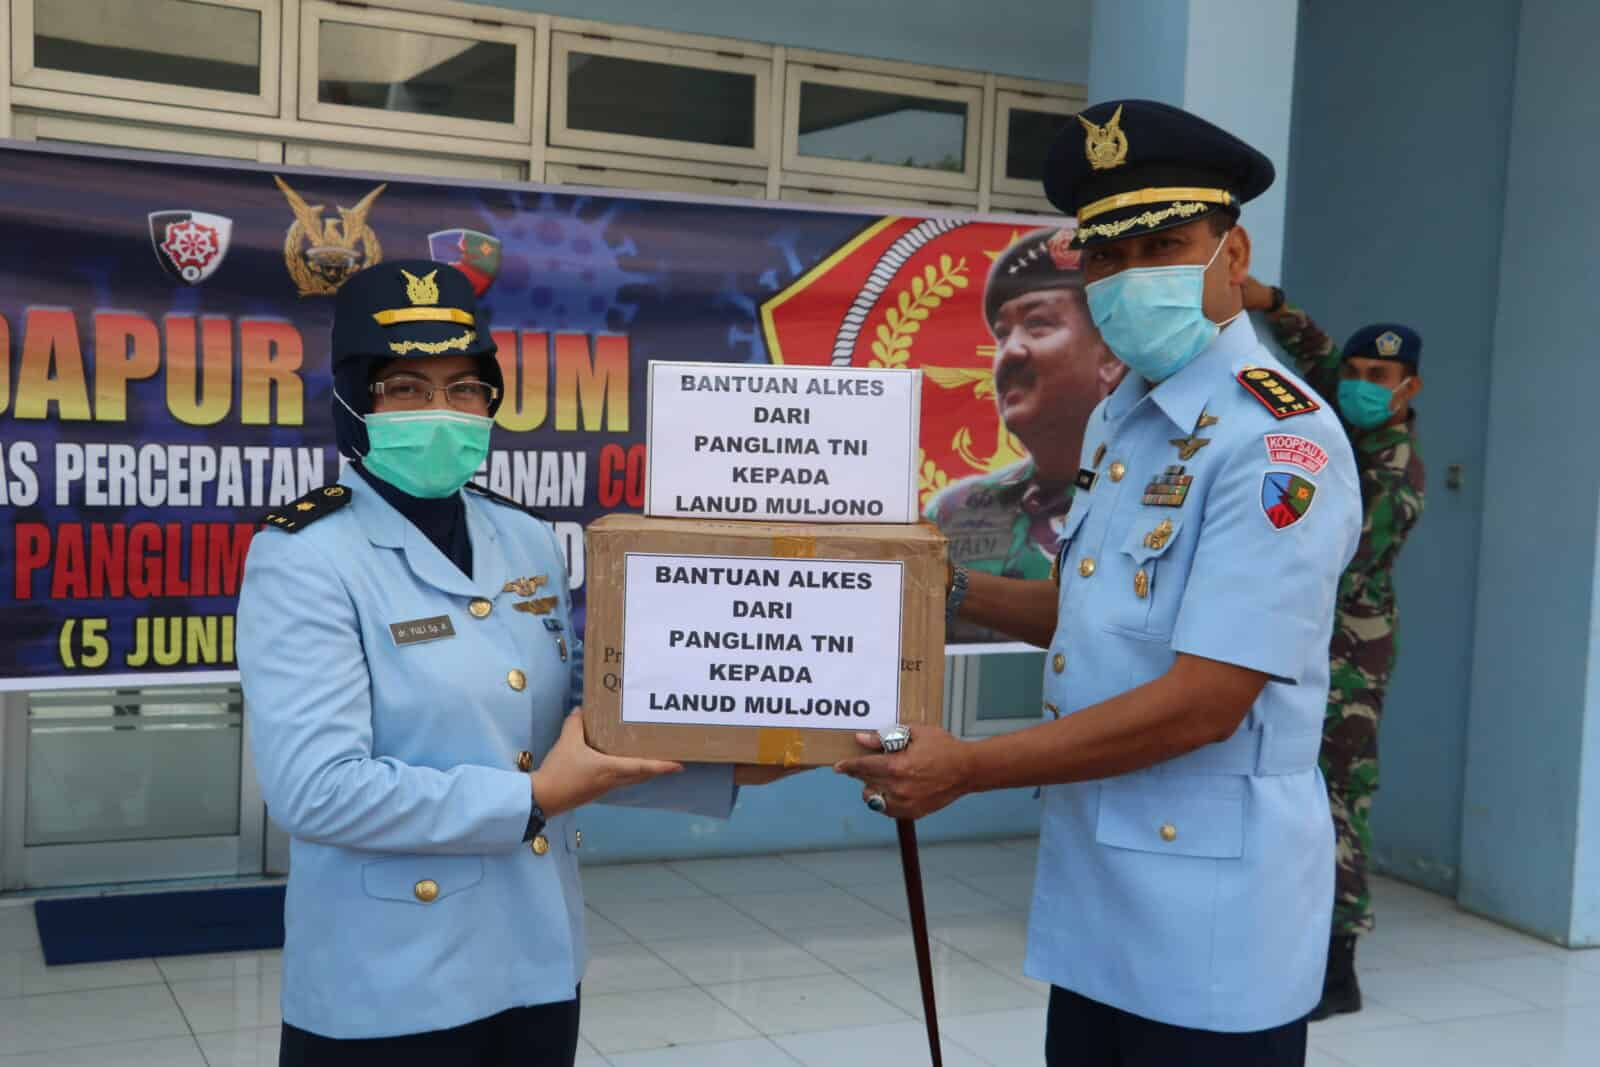 Danlanud Muljono Kolonel Pnb M. Somin, S.Sos serahkan APD ke RSAU Soemitro